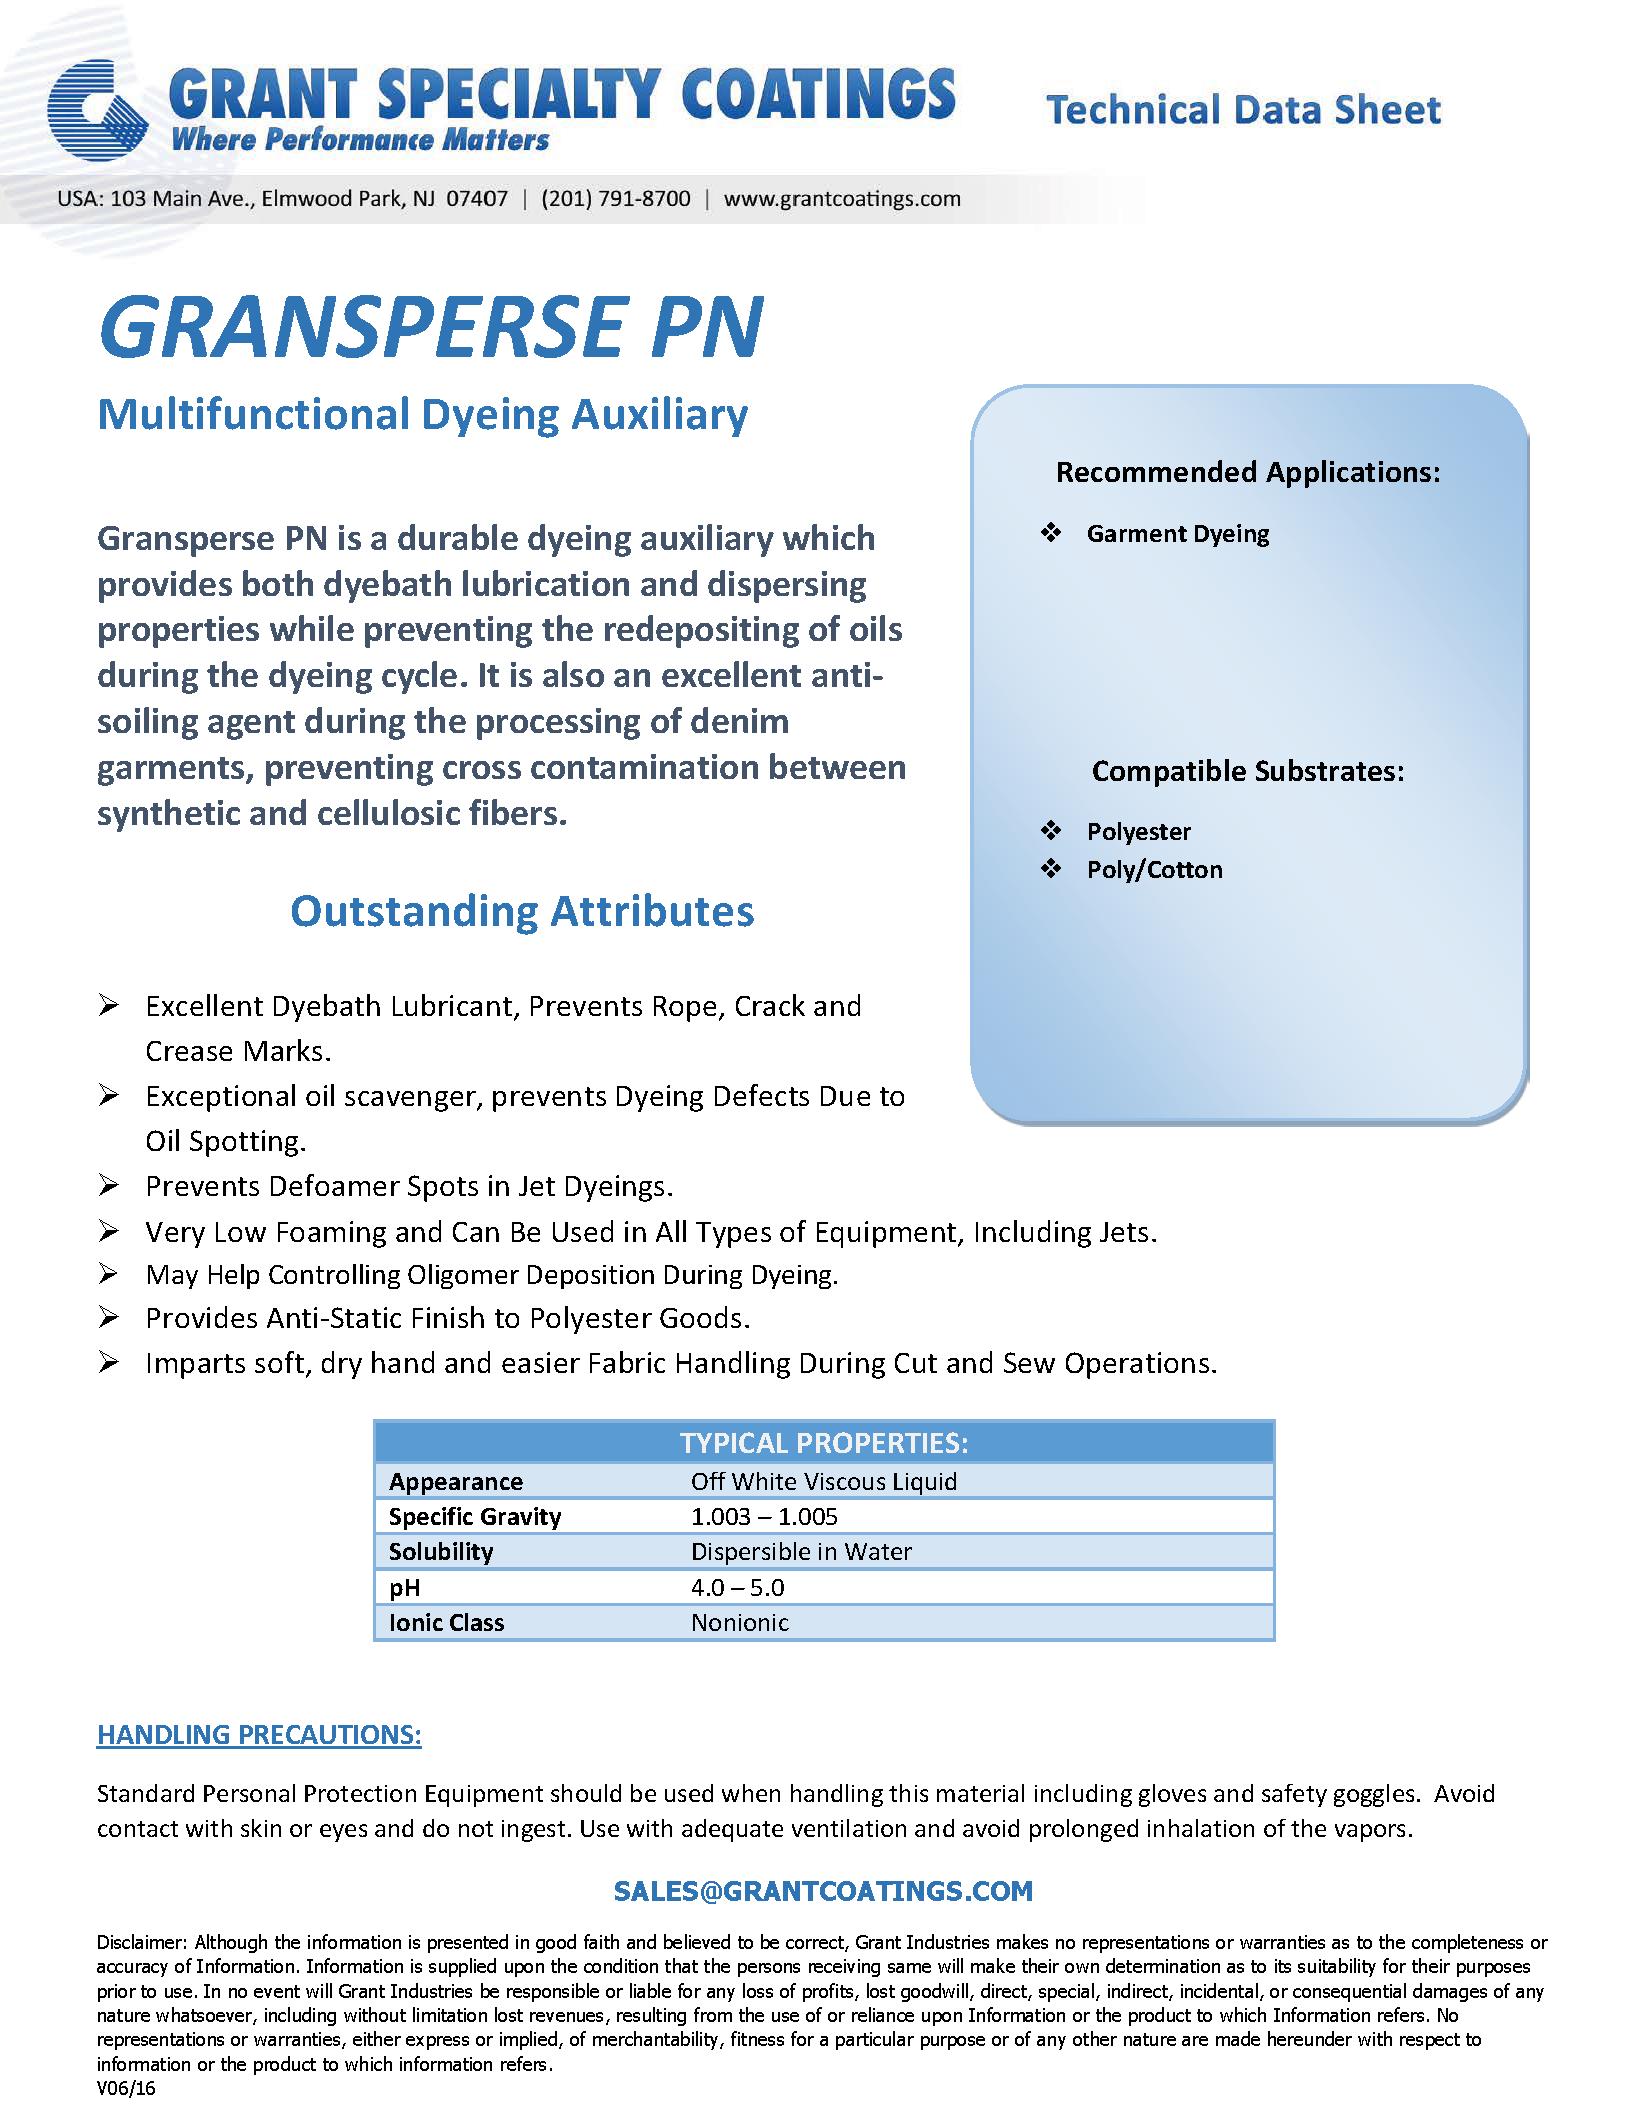 Garment Dyeing Leveling Dispersing Gransperse PN